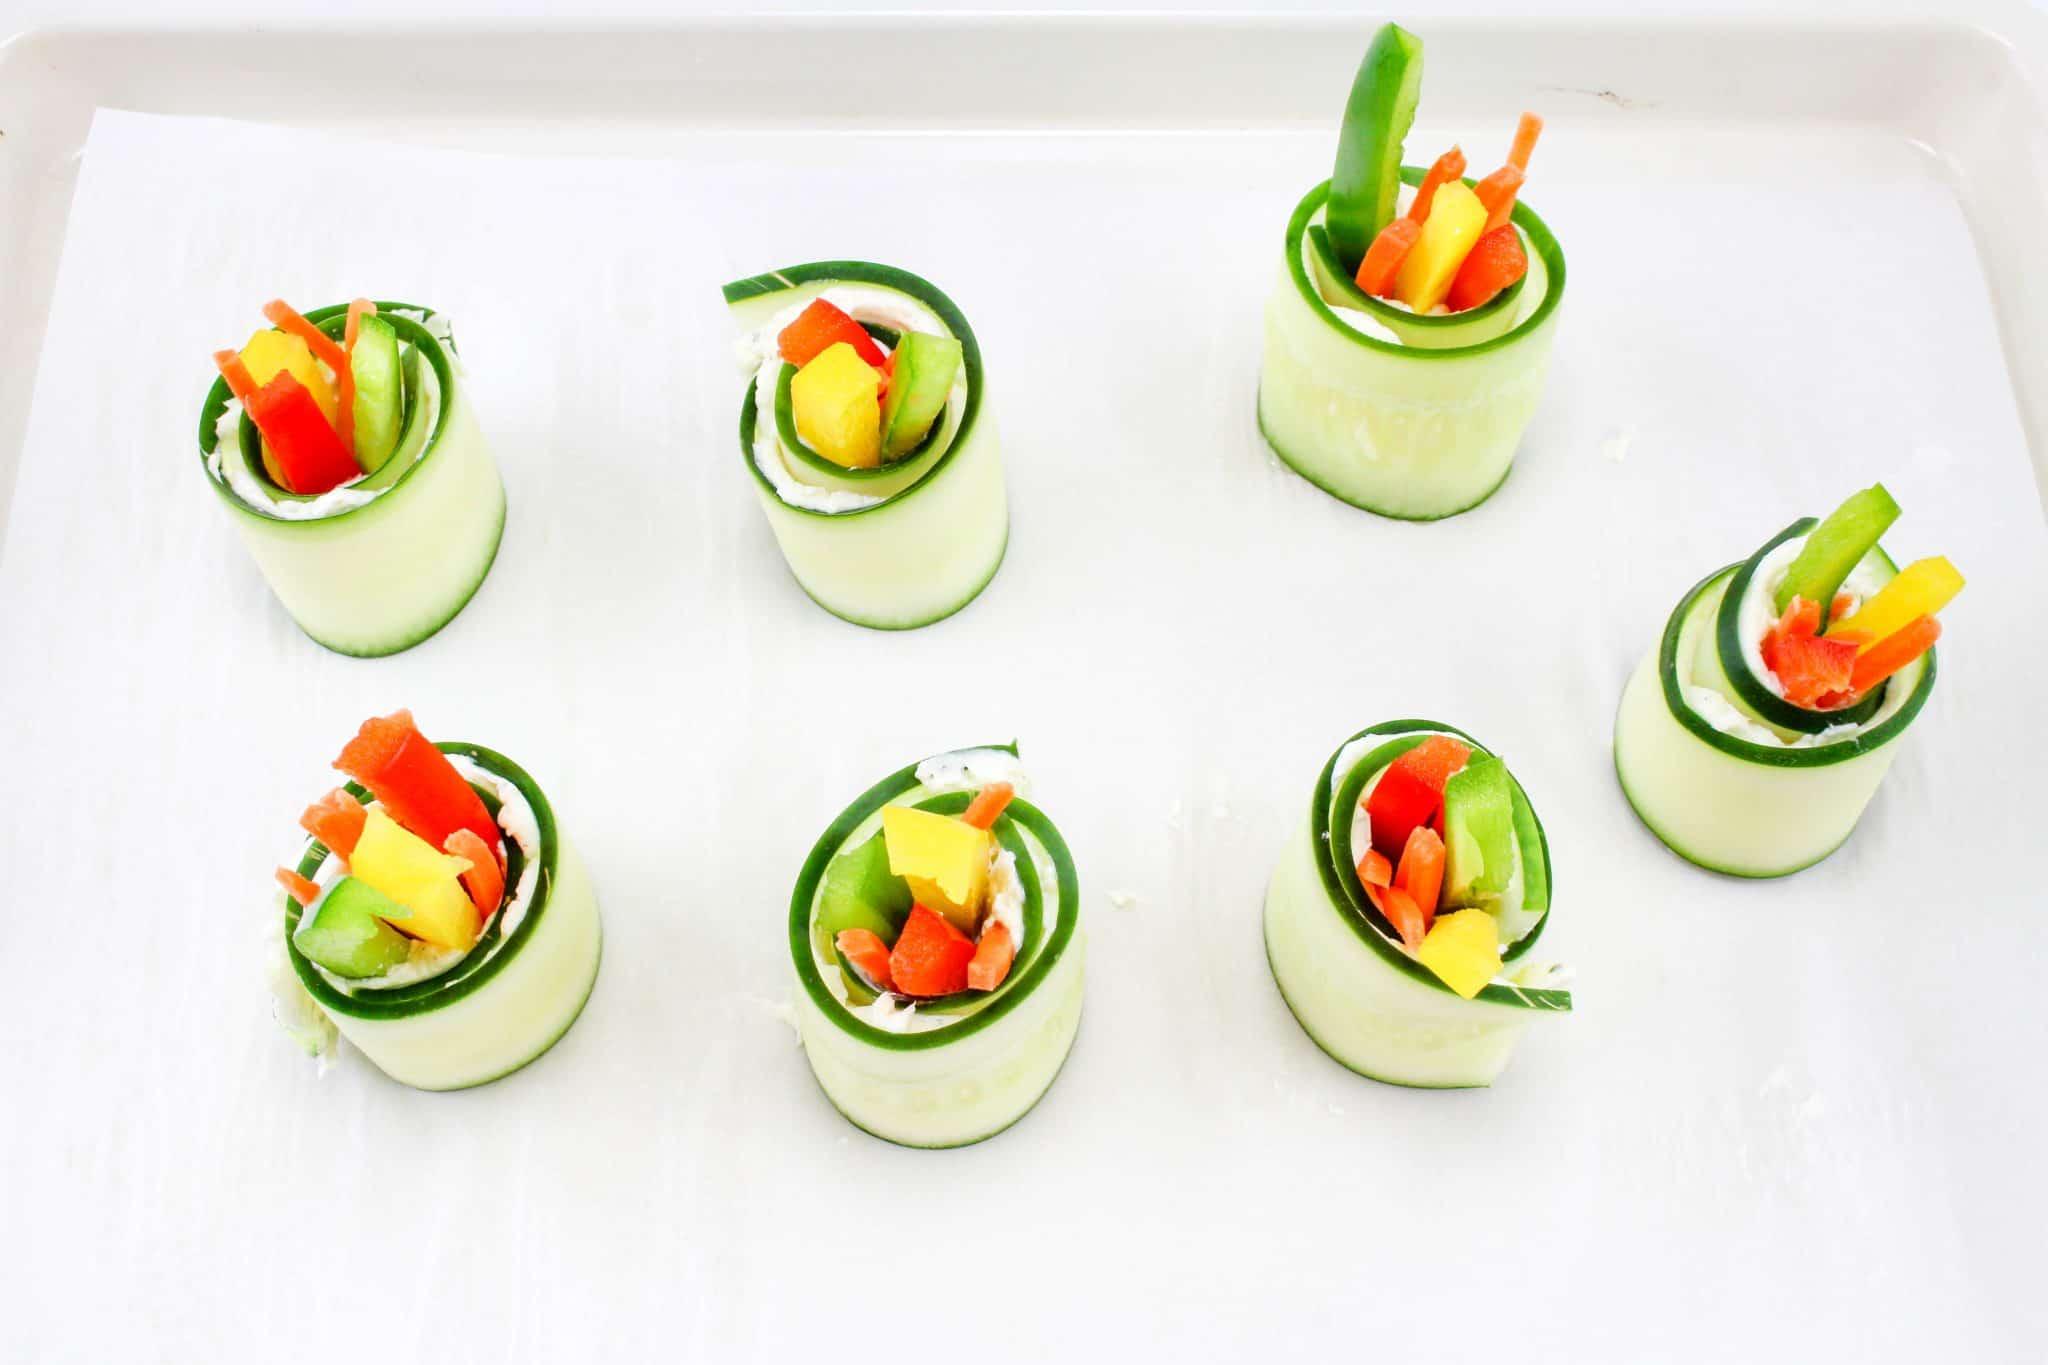 Tasty Vegetable and cucumber bites recipe